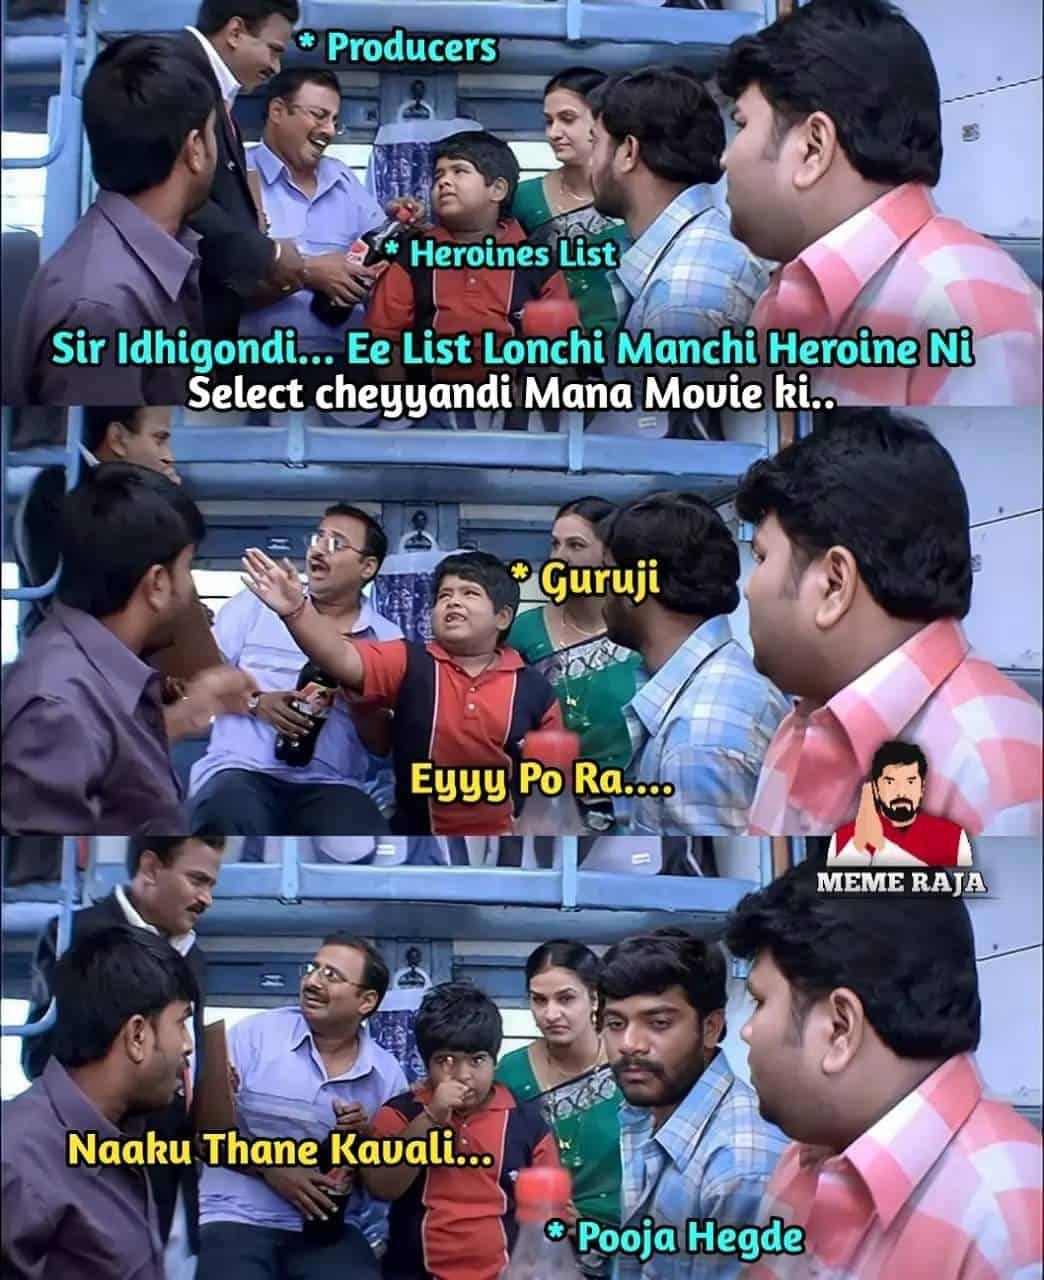 4.Trivikram-Pooja Hegde Combination memes